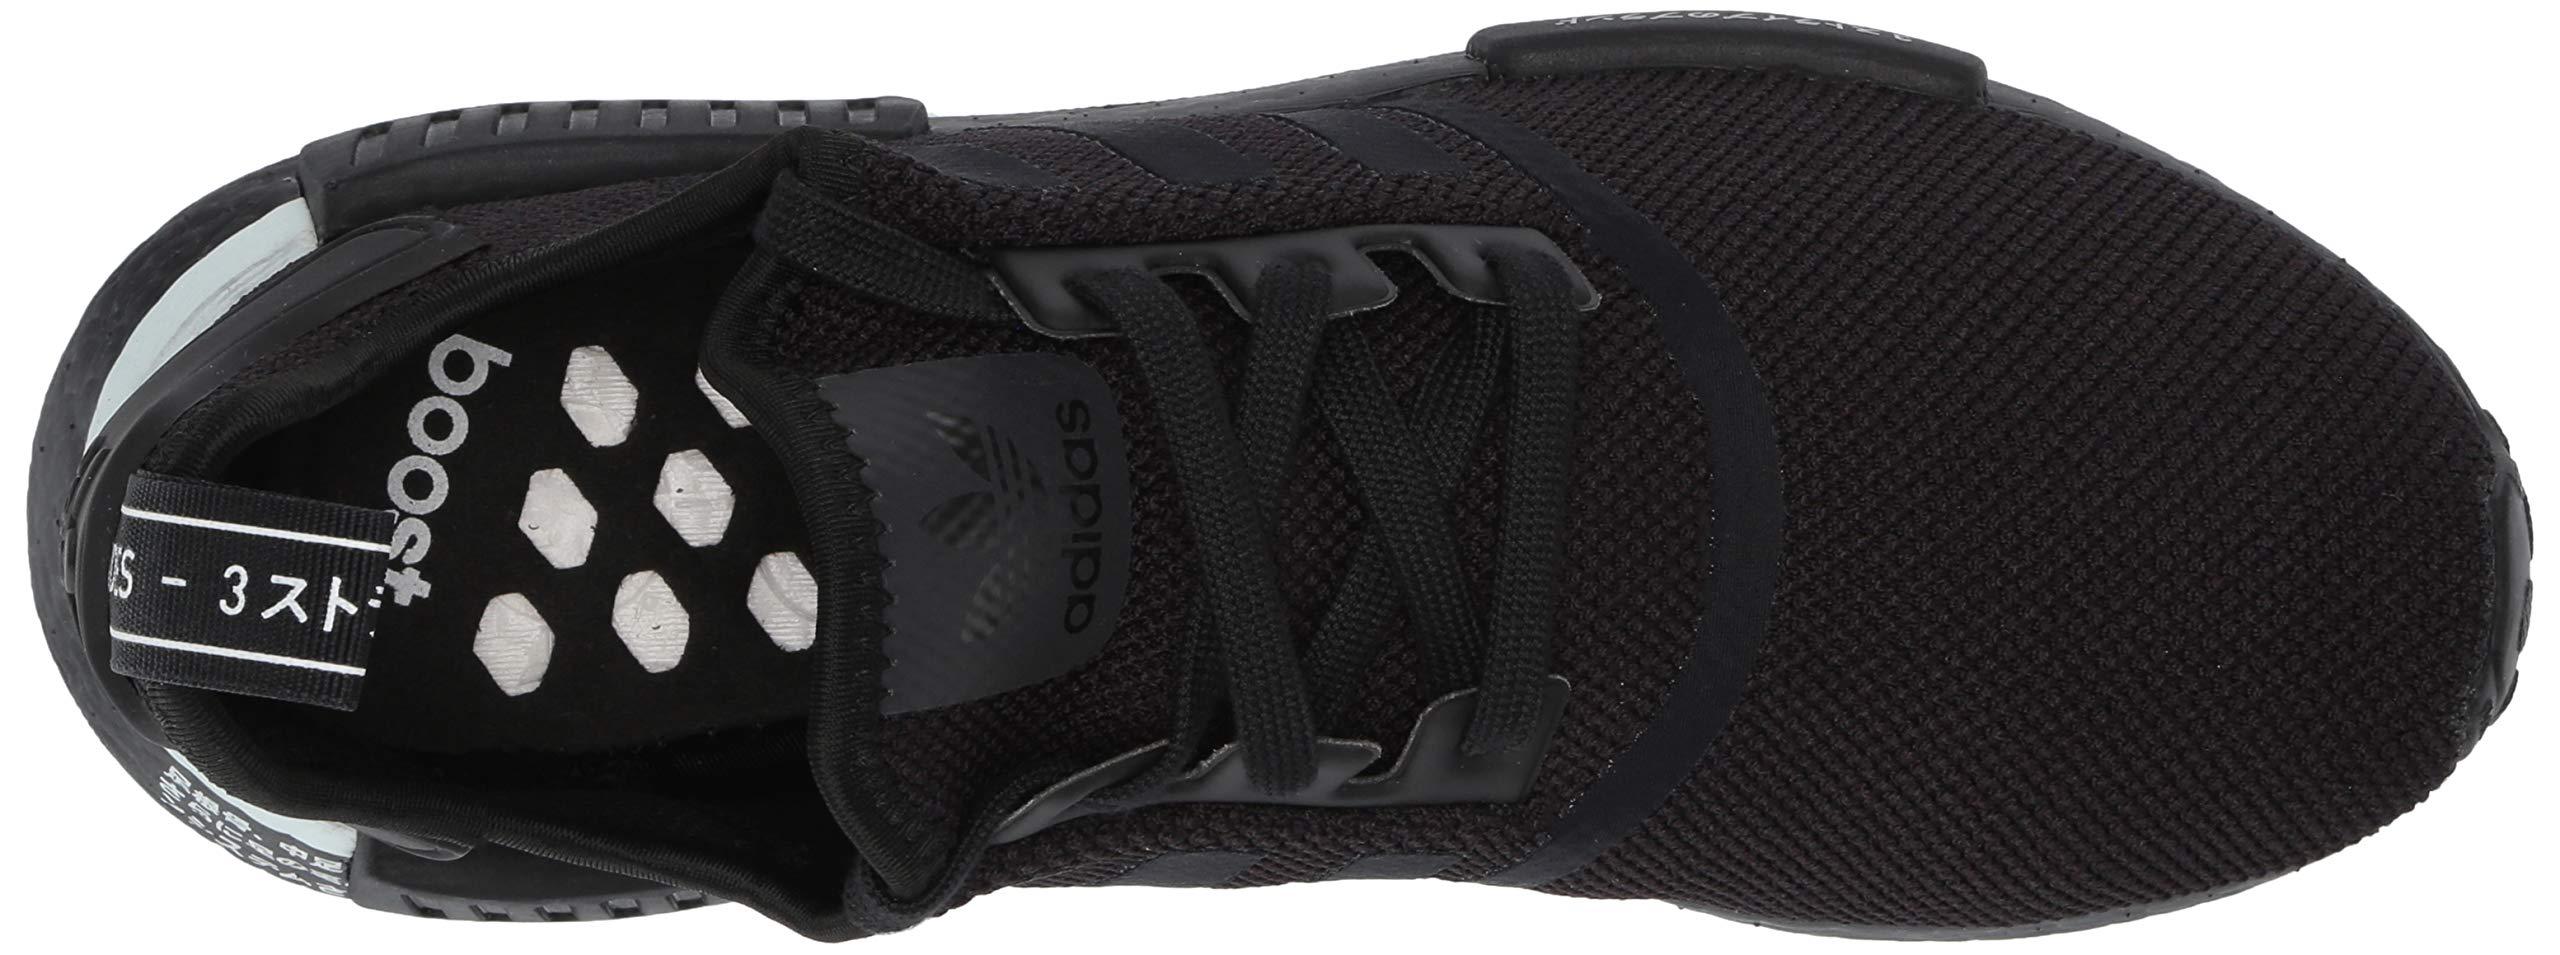 adidas Originals Men's NMD_R1 Running Shoe, Black/White, 4 M US by adidas Originals (Image #8)